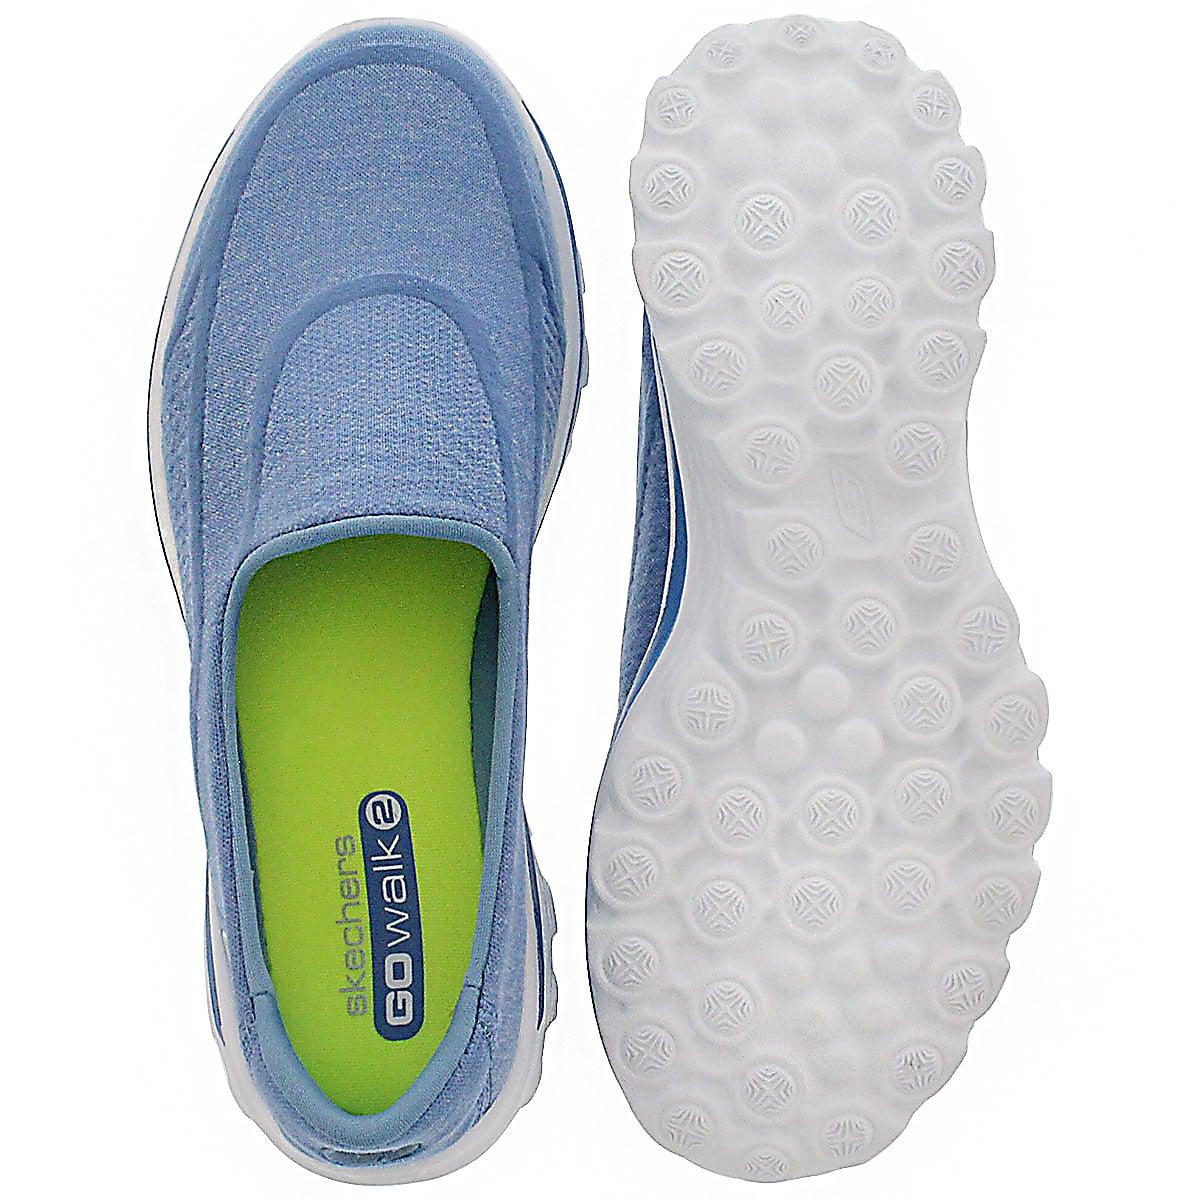 Flâneur bleu/bla GOwalk SUPER SOCK, fem